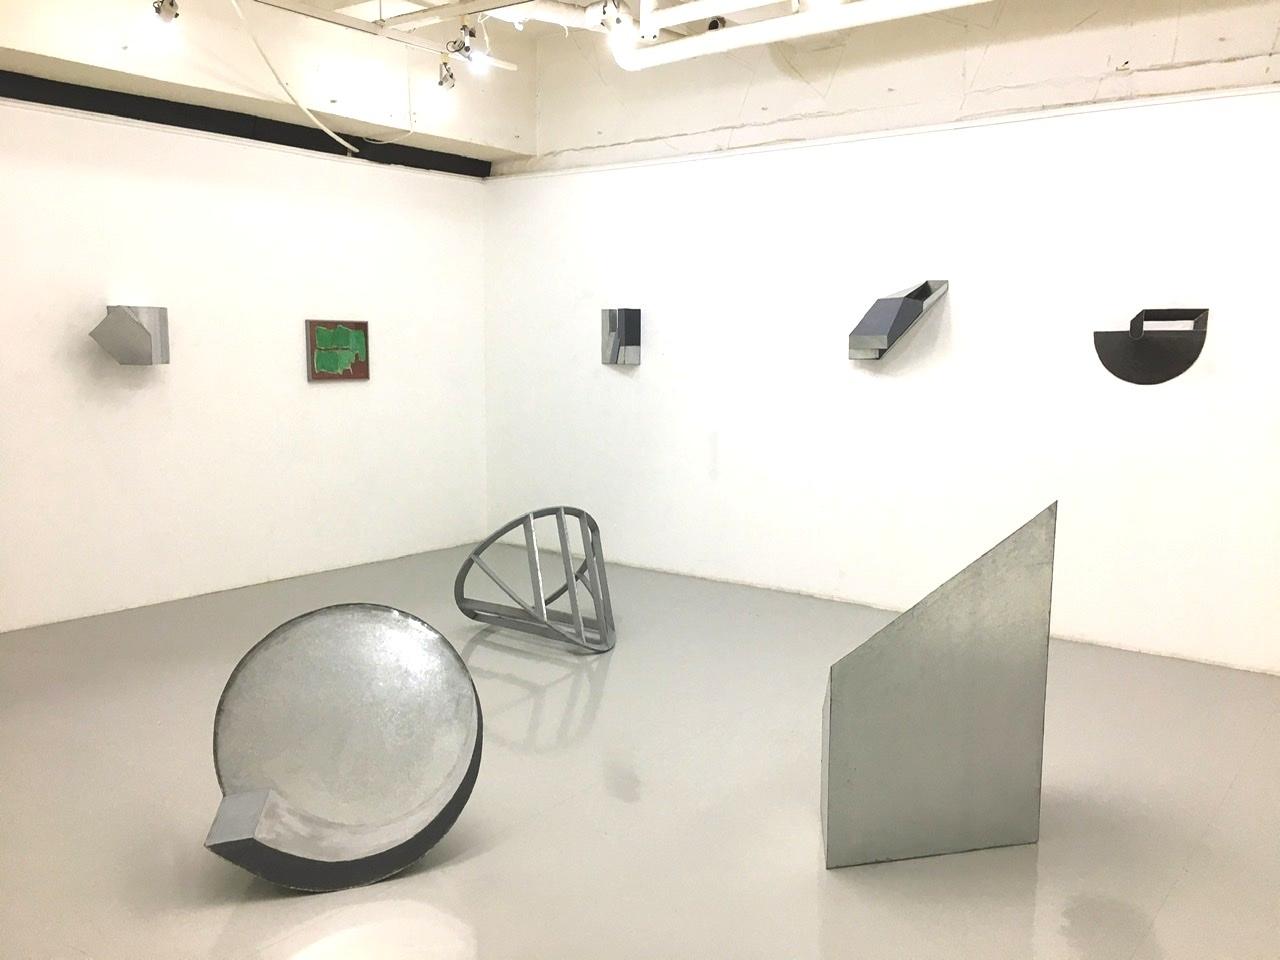 赤塚祐二&伊藤誠展/Yuji AKATSUKA & Makoto ITO exhibition_d0271004_00150590.jpeg